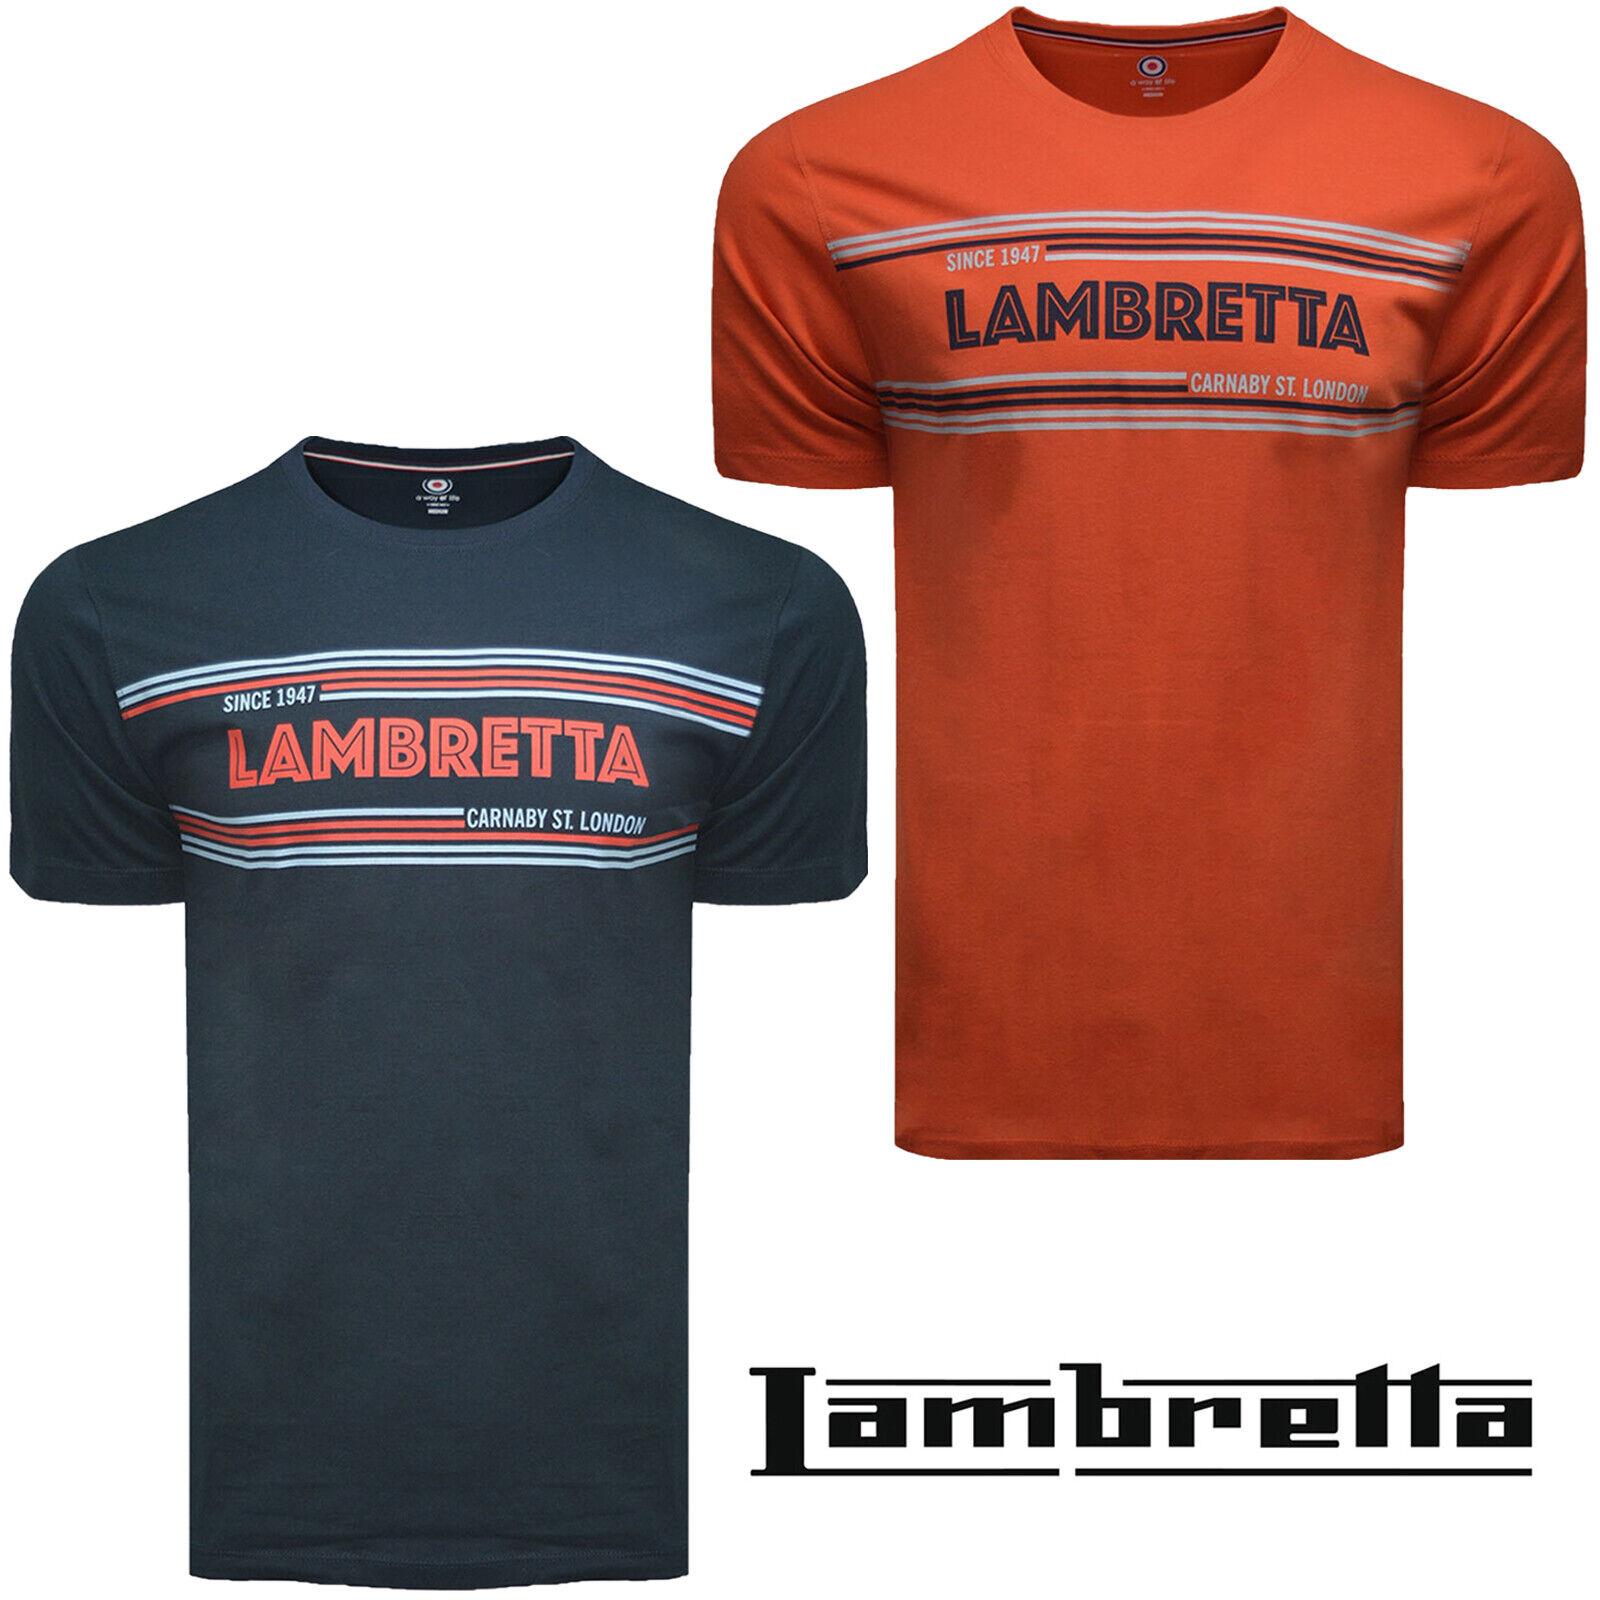 Lambretta T-Shirts Print Short Sleeve A Way Of Life Mens Retro Cotton UK S-4XL